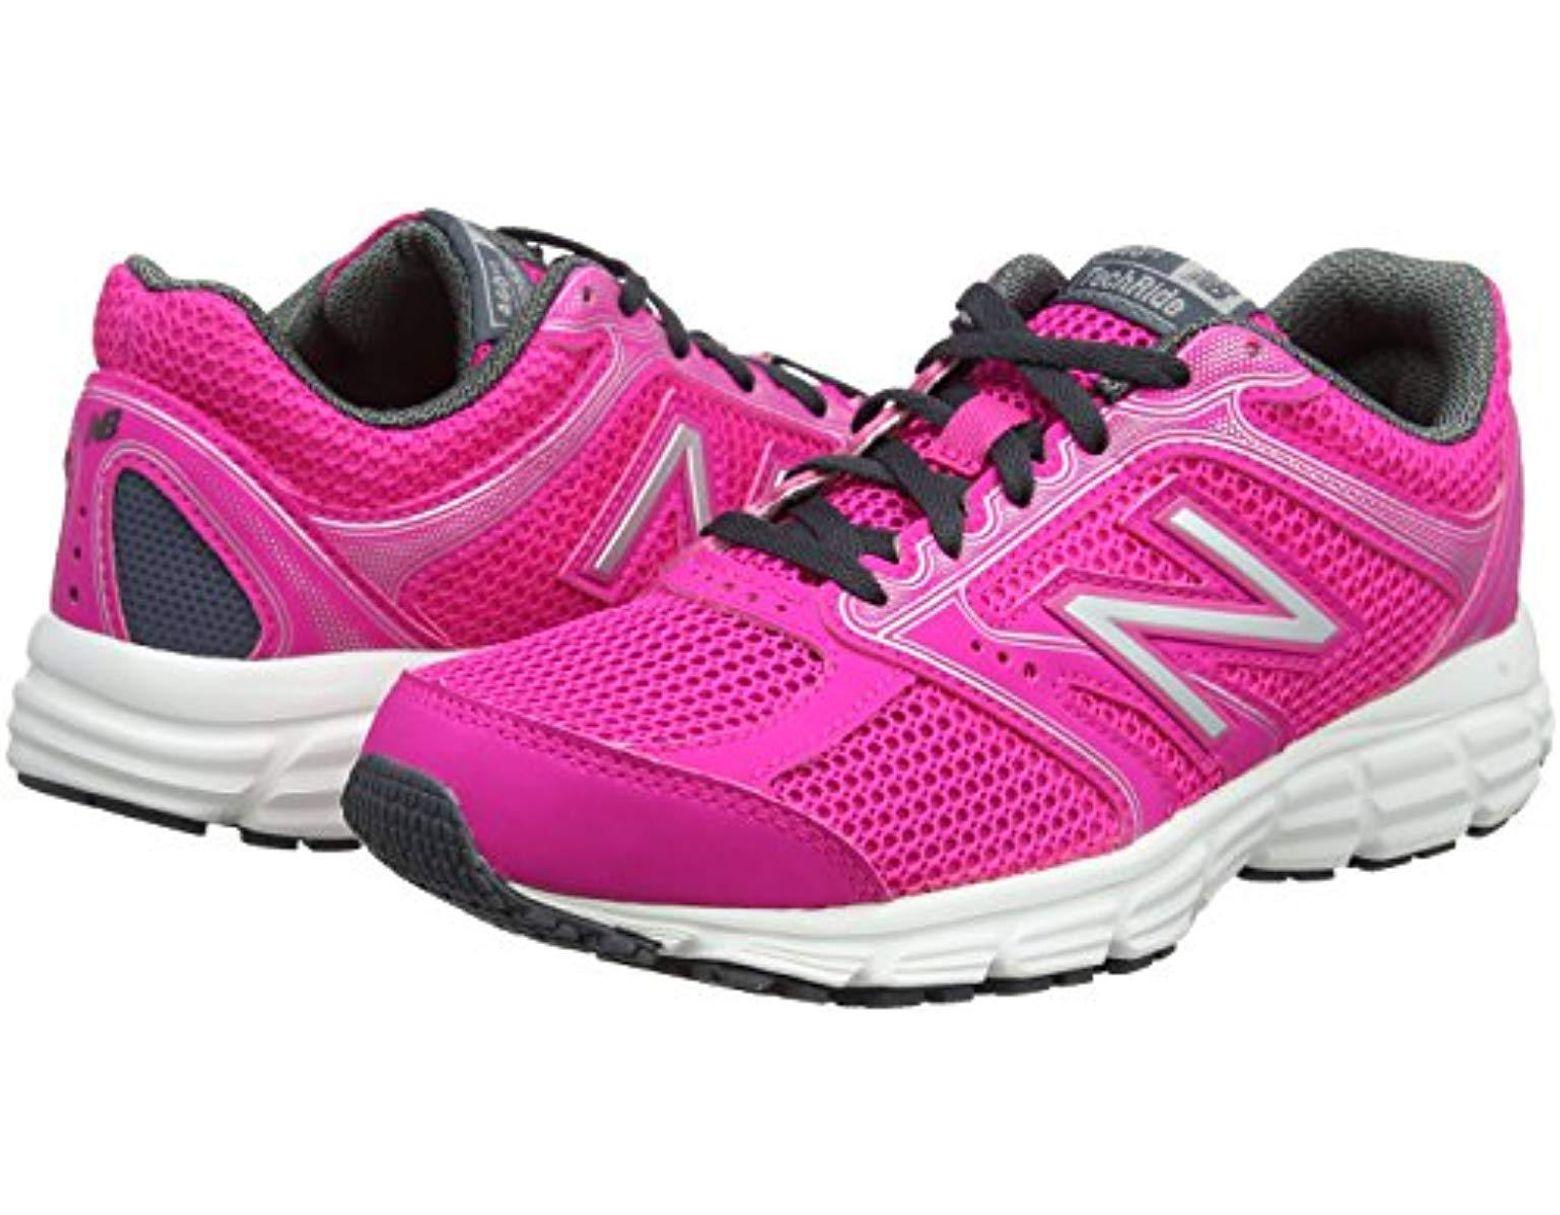 Womens W460V2 Shoes New Balance Women's